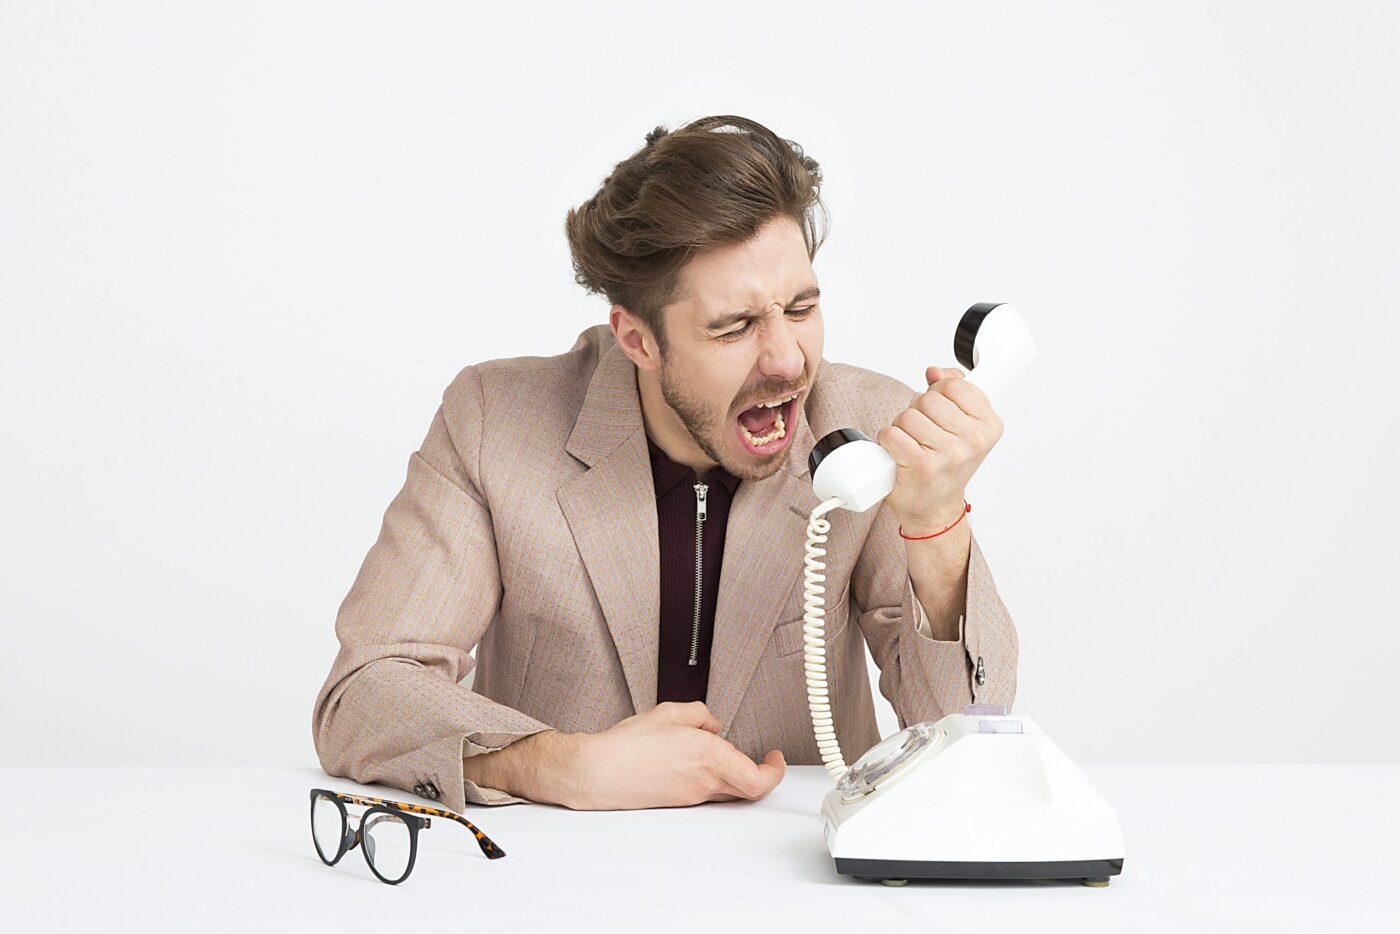 Kundenservice im Social-Media – Fluch oder Segen?